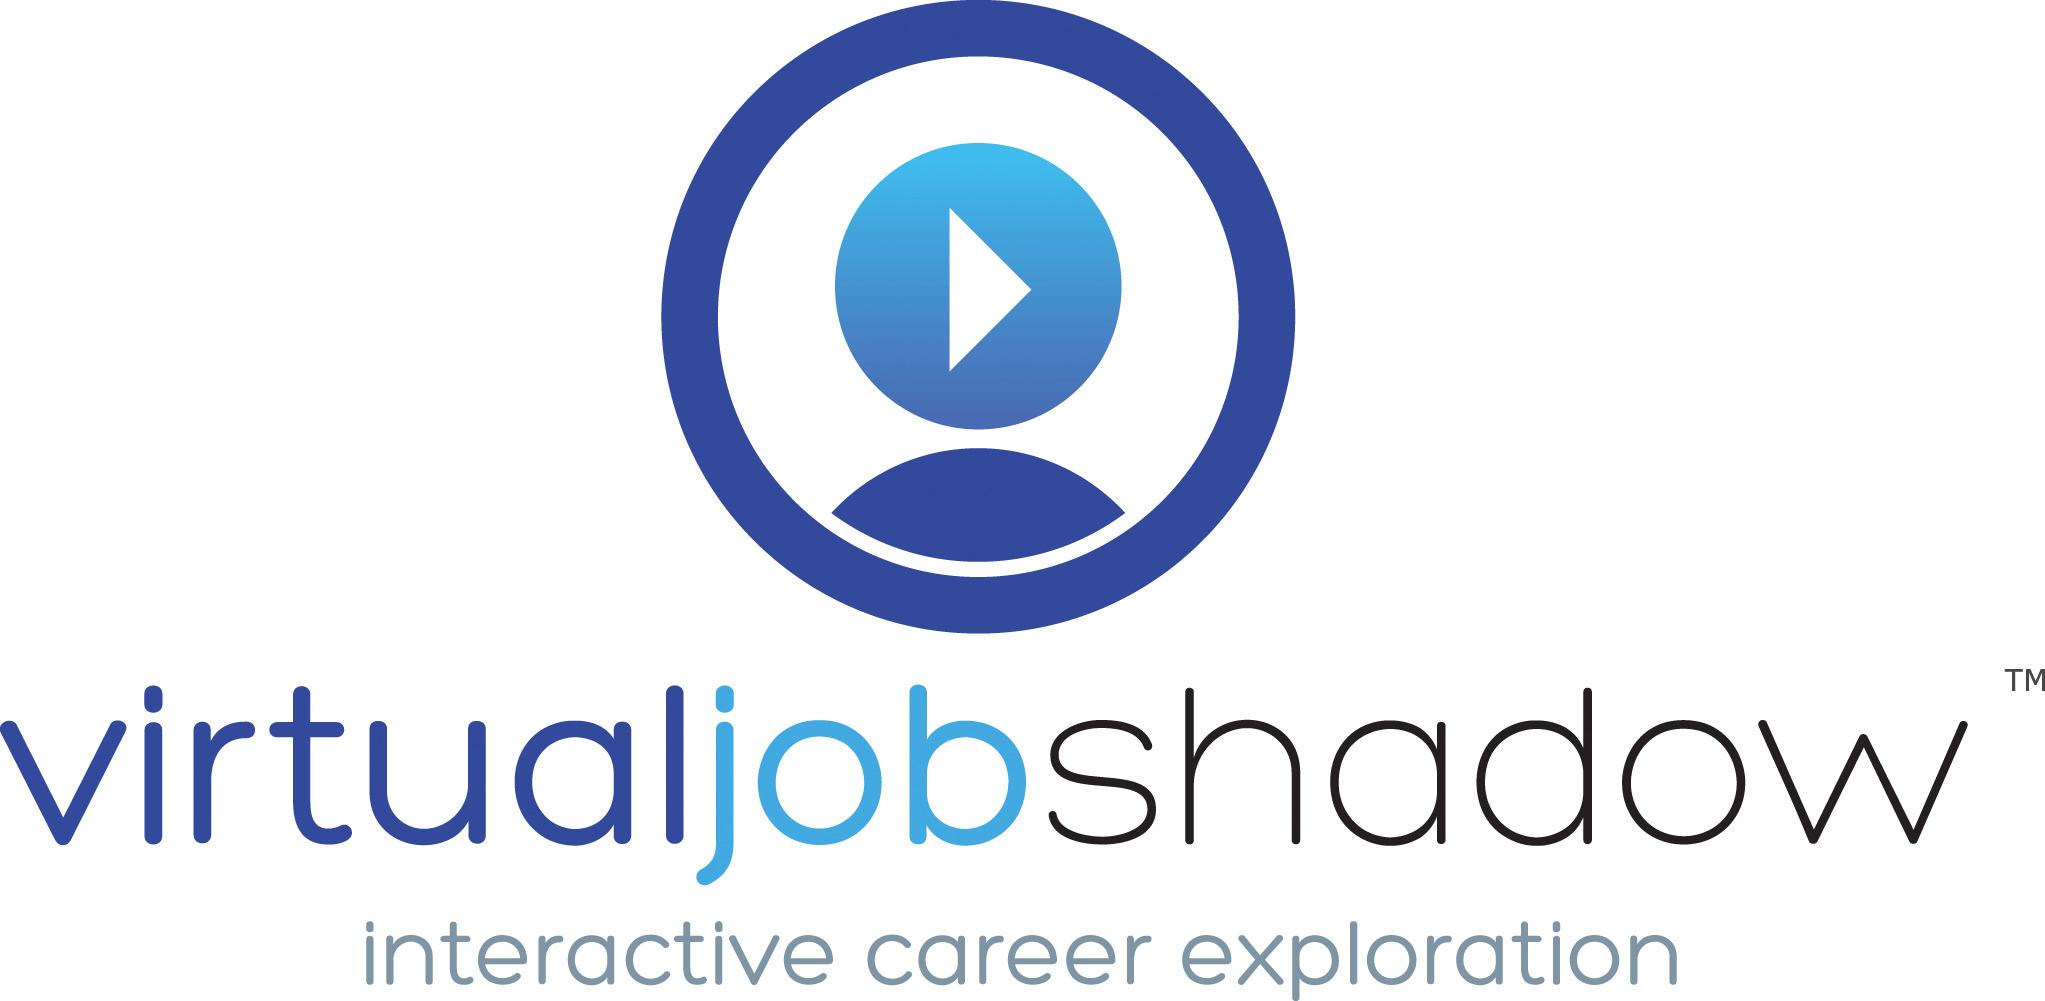 Career Exploration & Job Shadowing